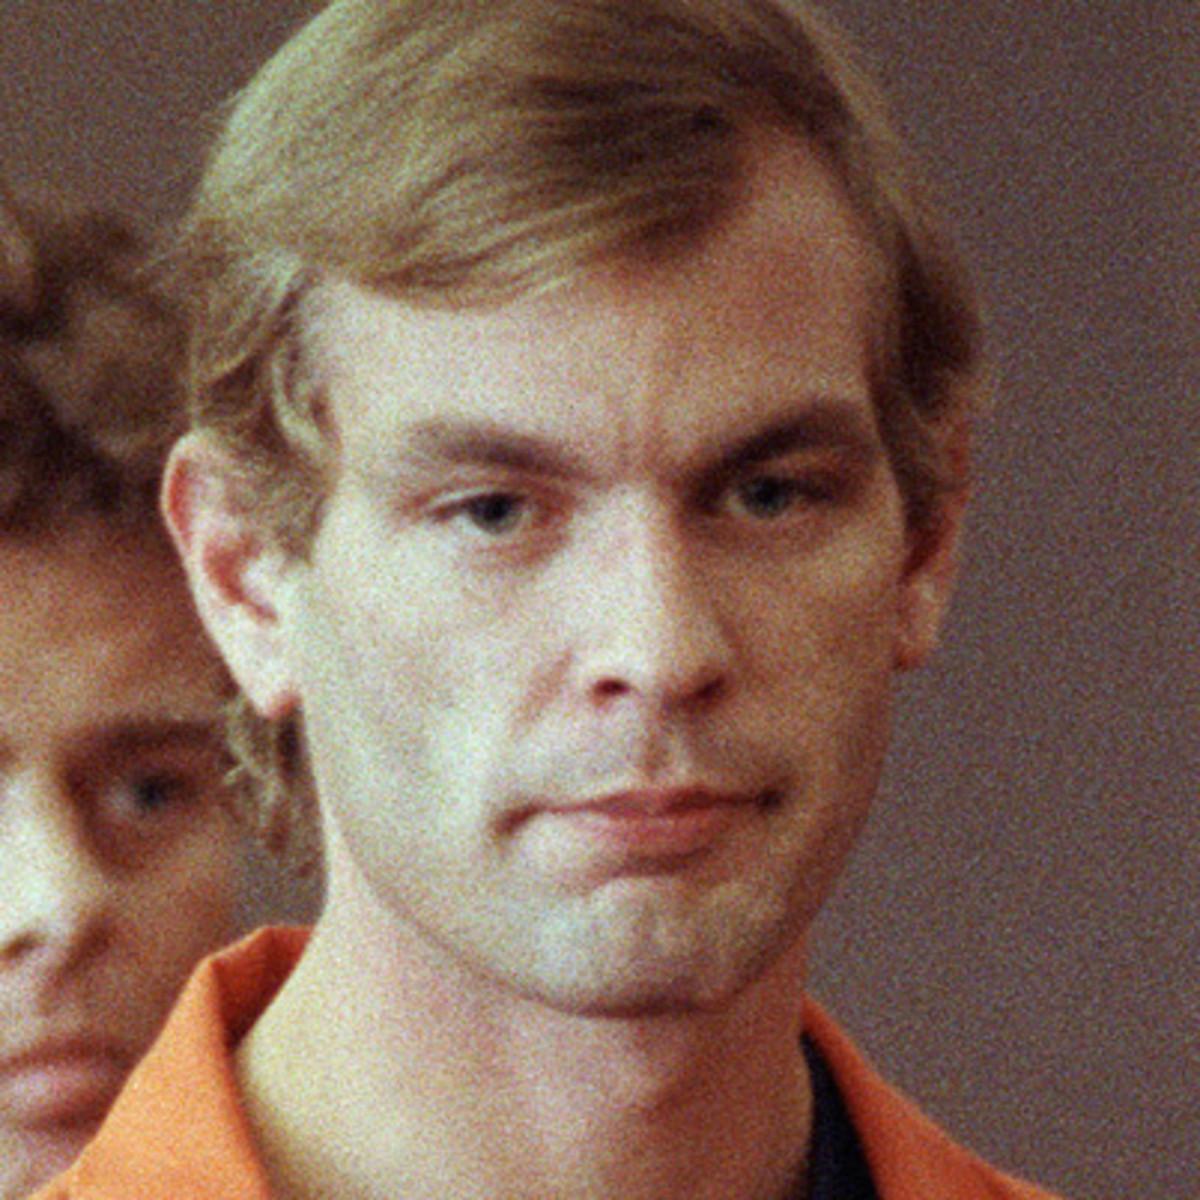 Jeffrey Dahmer.png